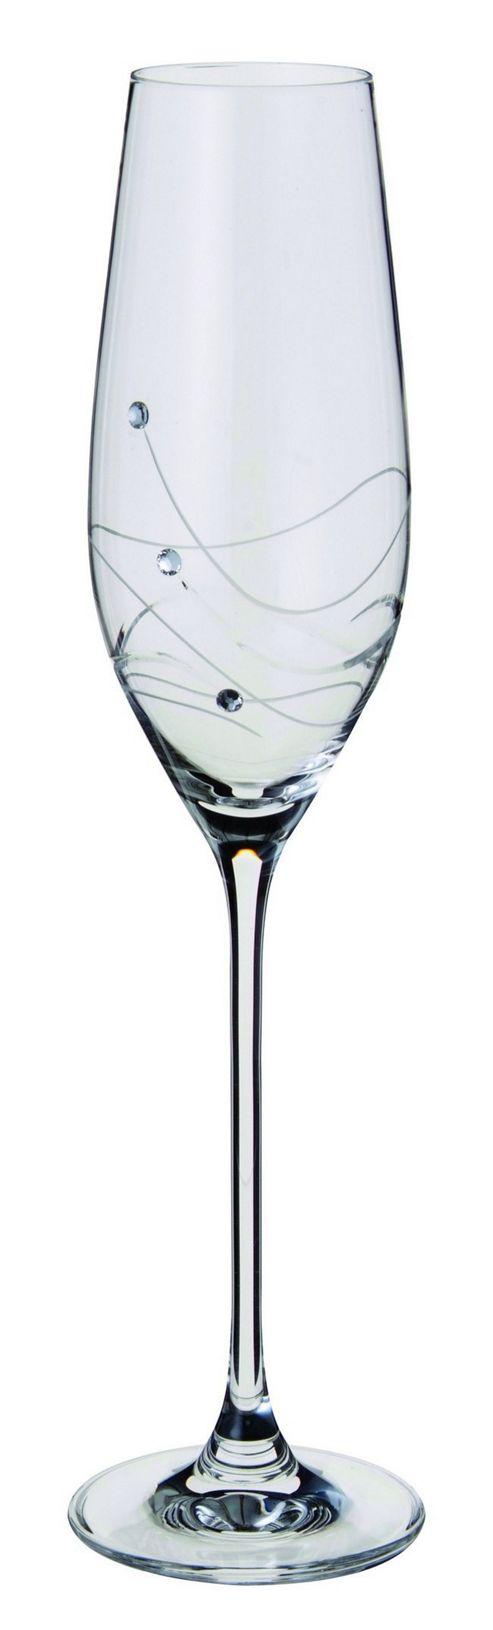 Dartington Crystal - Glitz Collection Flute Pair